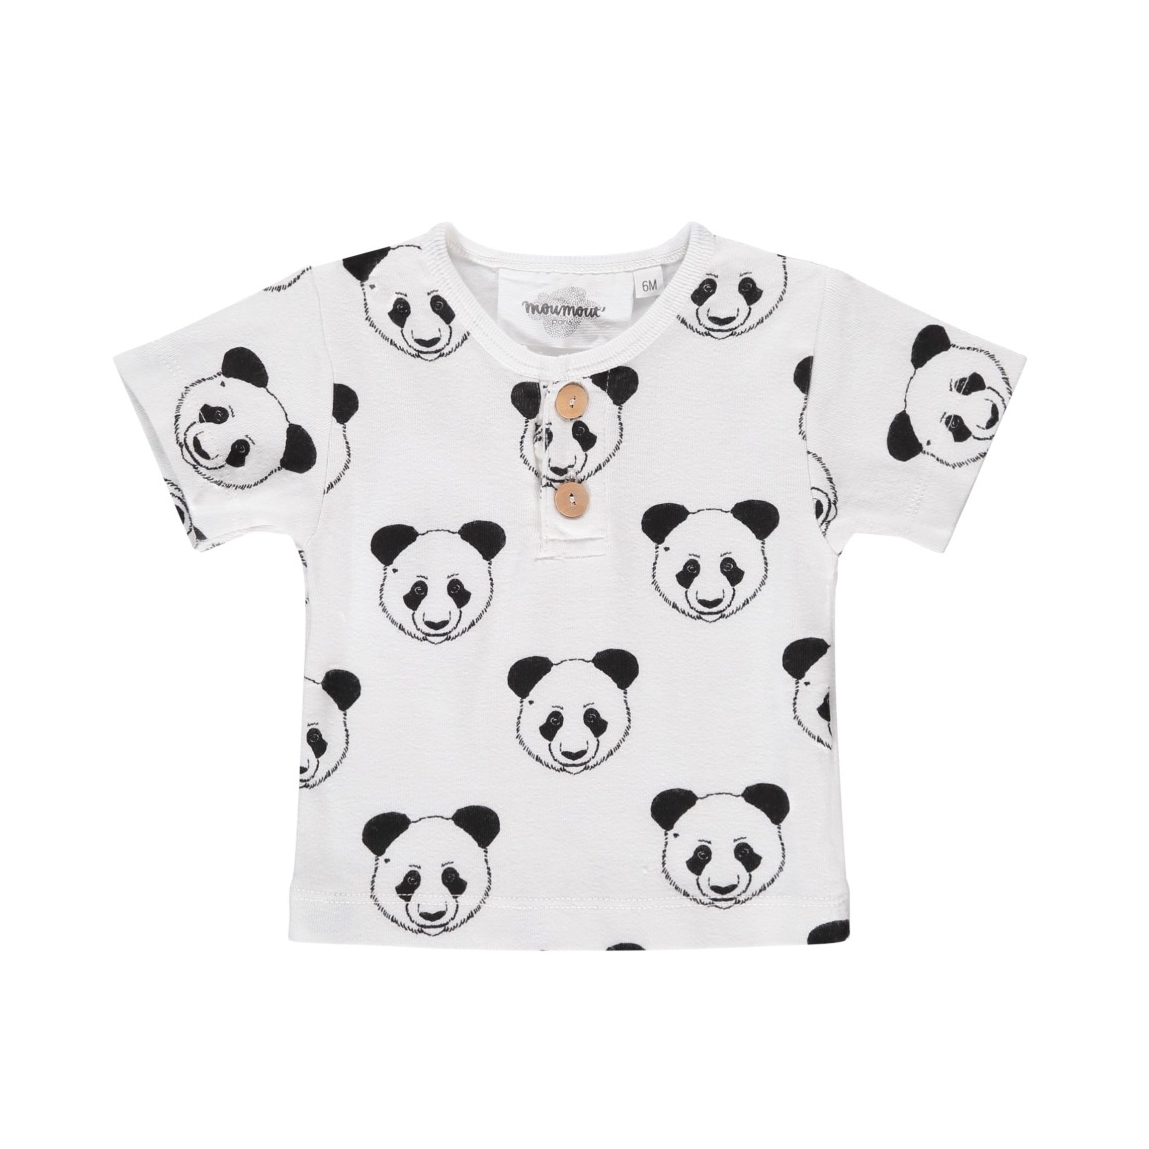 moumout-panda-smallable